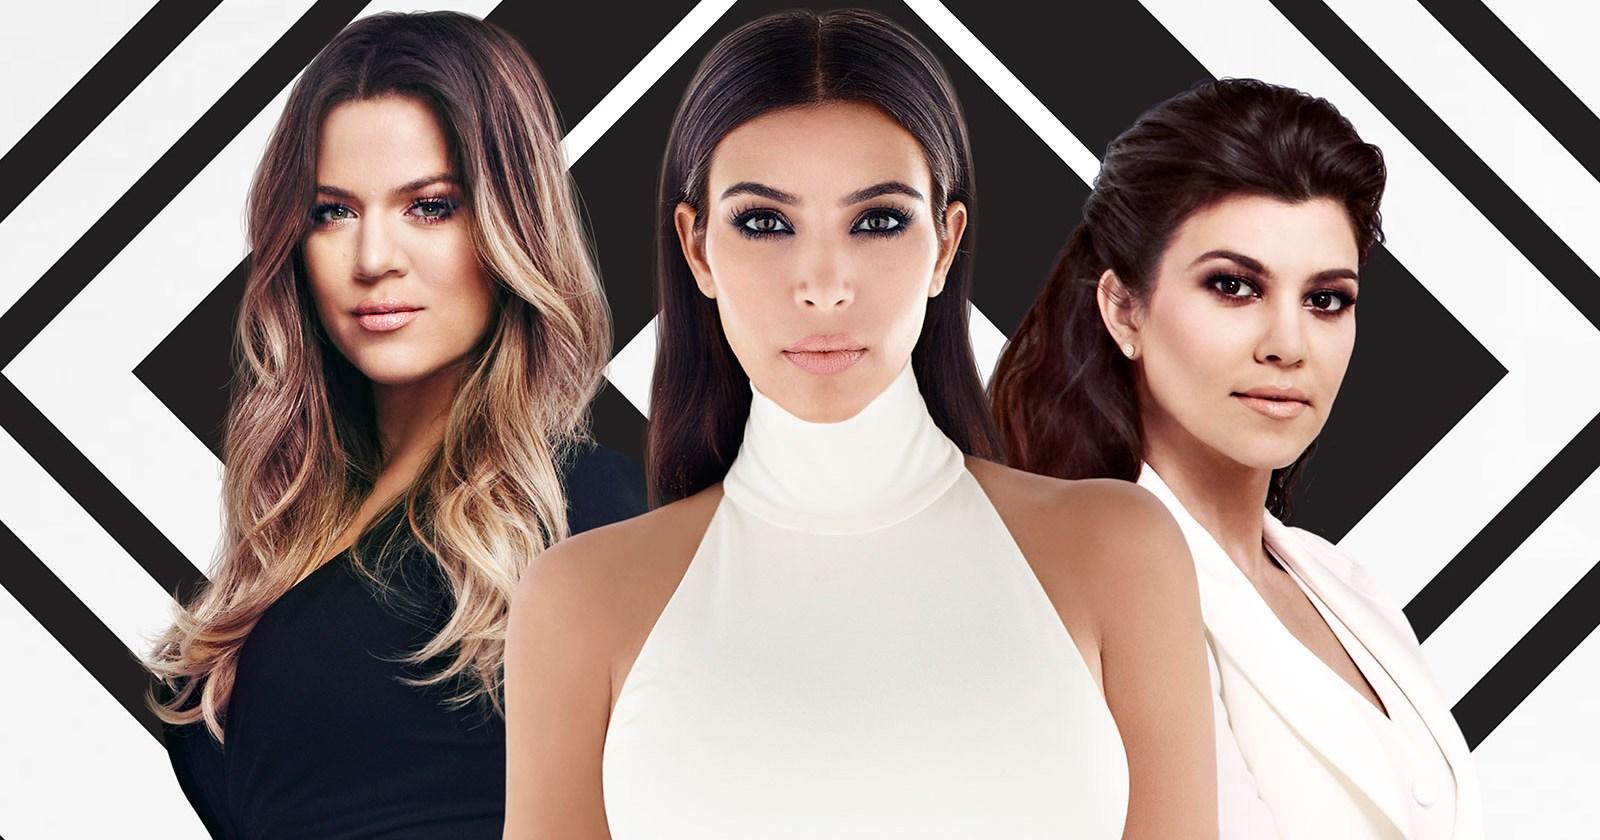 'KUWTK' Recap: Kim Kardashian Talks About Surrogate, Losing Embryo